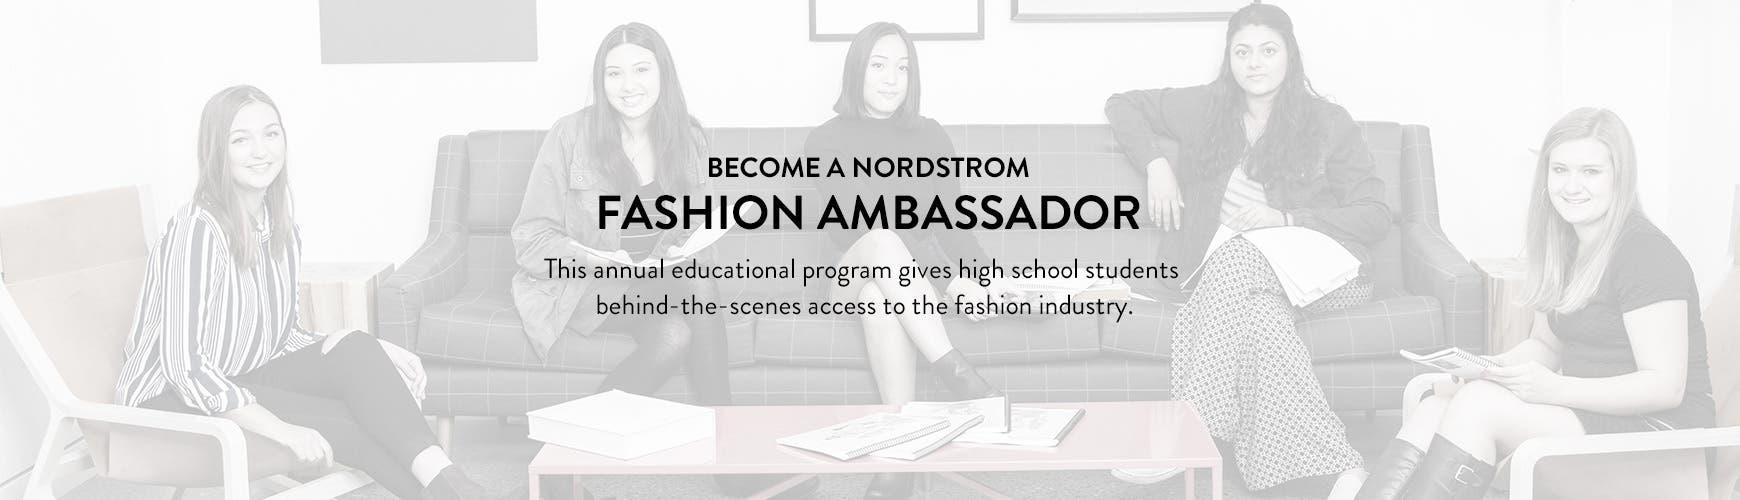 Become a Nordstrom Fashion Ambassador.